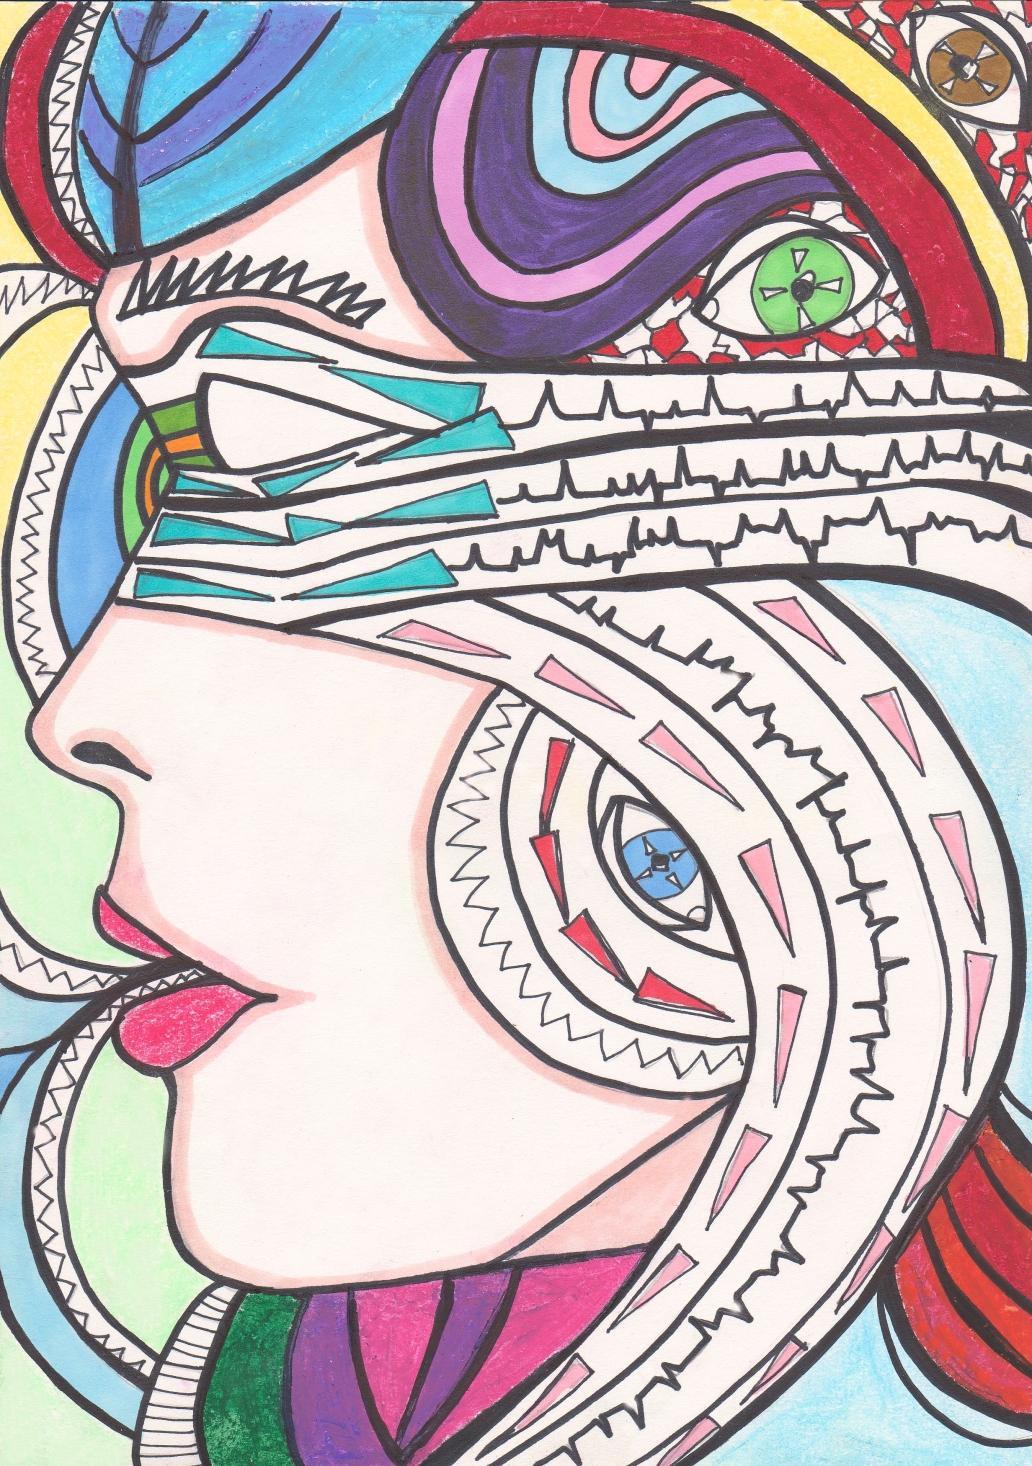 A Kind of Healing - By Charlotte Farhan